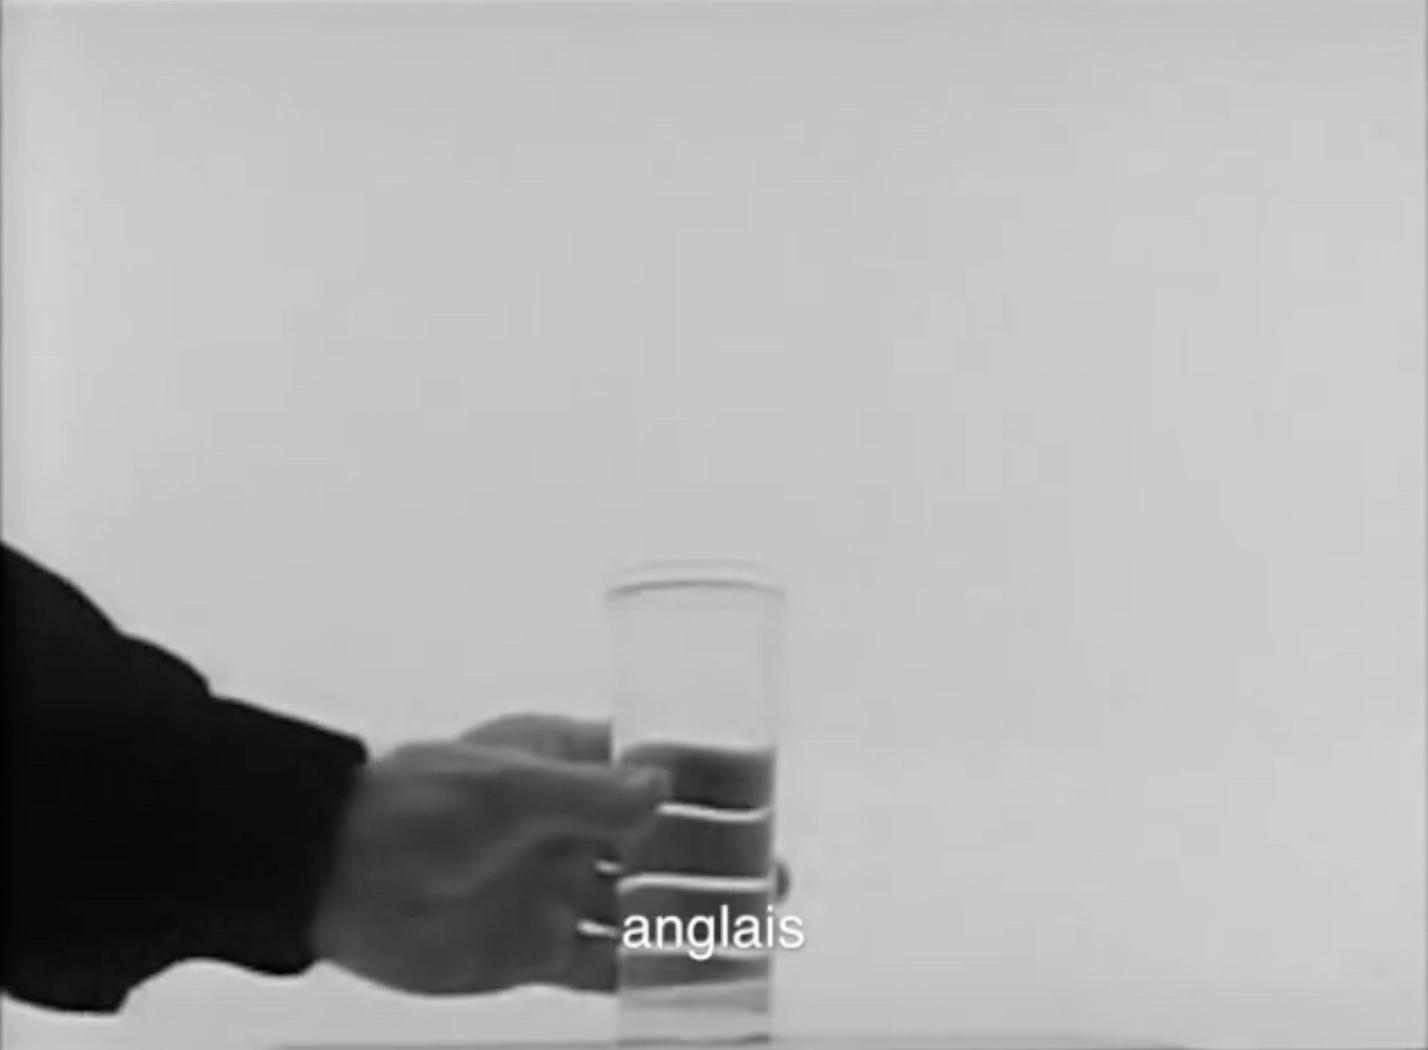 Tarek Lakhrissi, Hard to Love (film still), 2017. Single channel video. 00:04:47. Edition of 5 (+1AP).